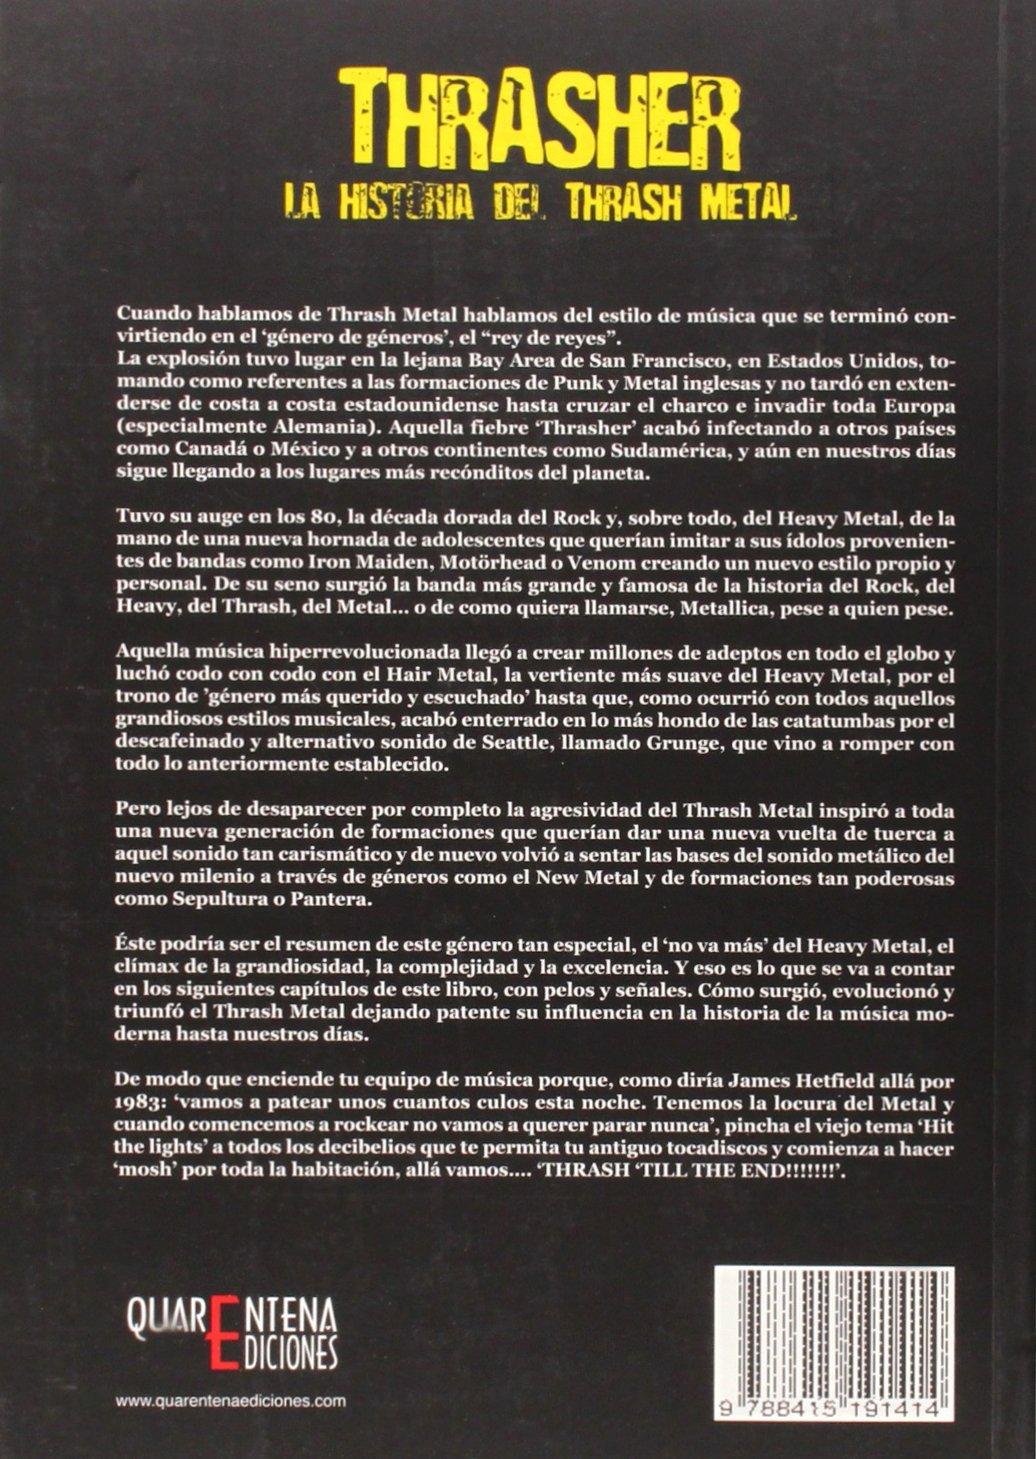 THRASHER: ANTONIO VALSECA: 9788415191414: Amazon.com: Books